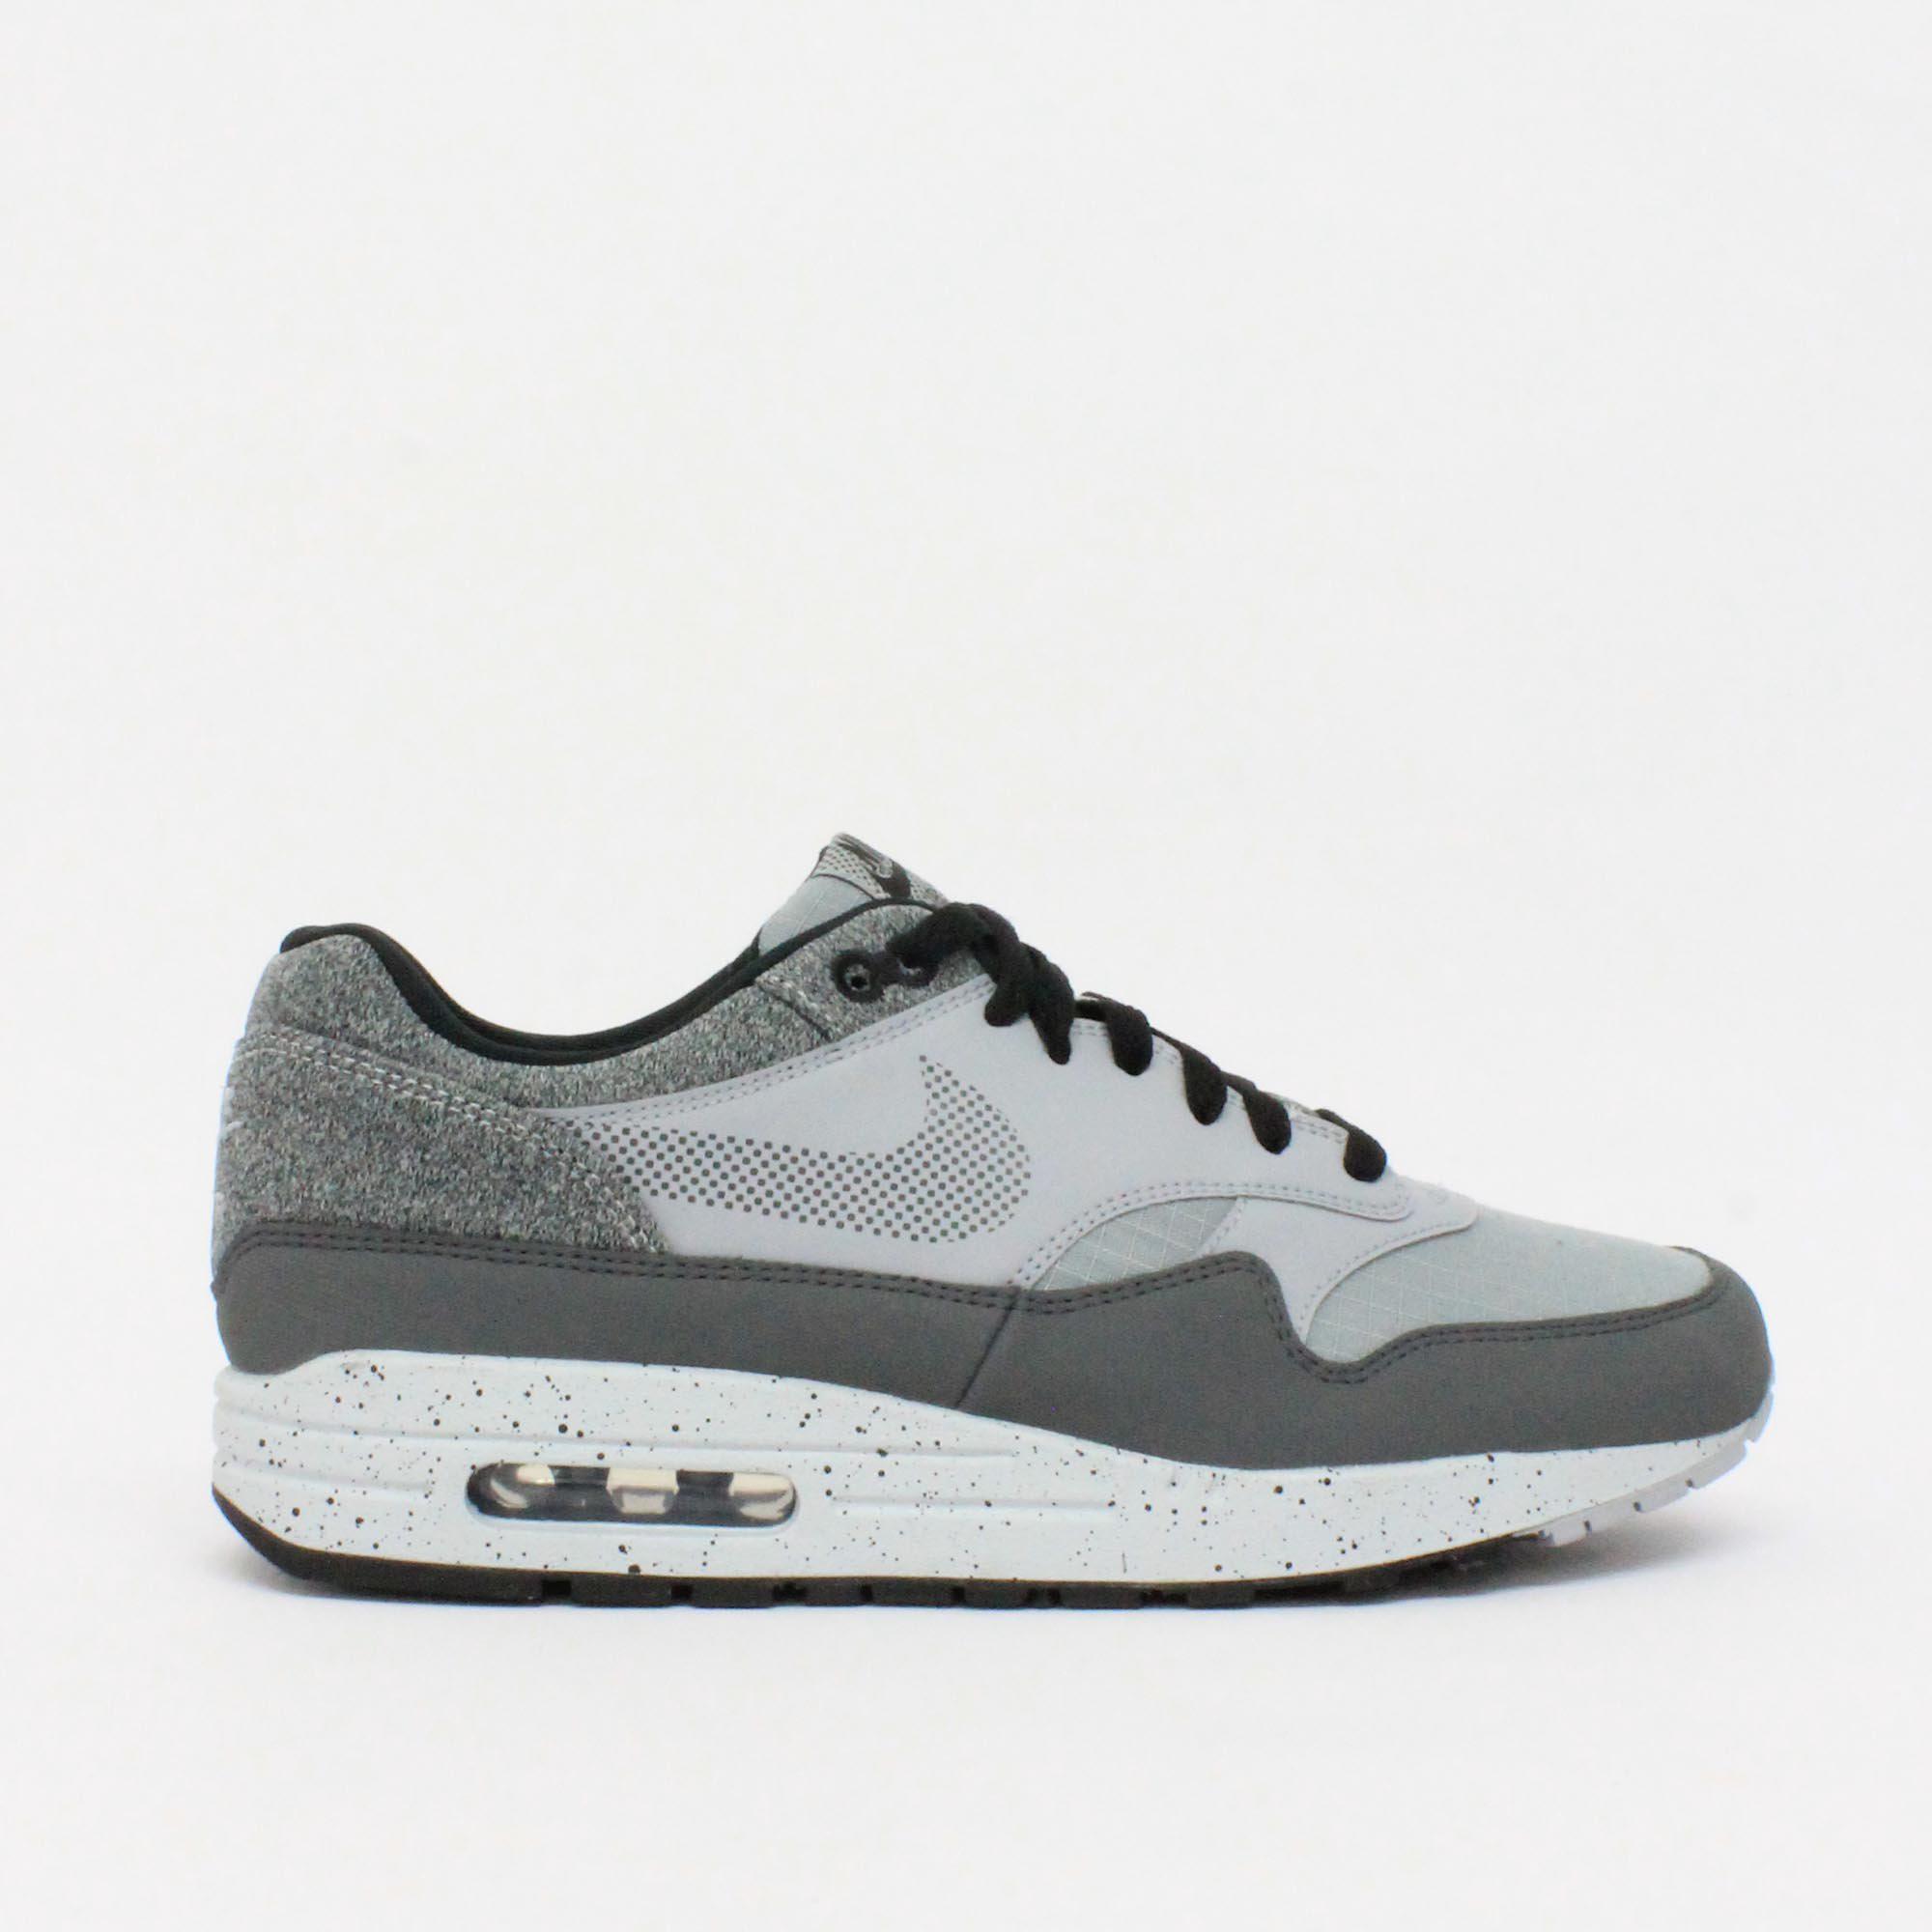 3c8e13b8eef Lyst - Nike Trainers Nike Air Max 1 Premium Se Wolf Grey Ao1021 002 ...